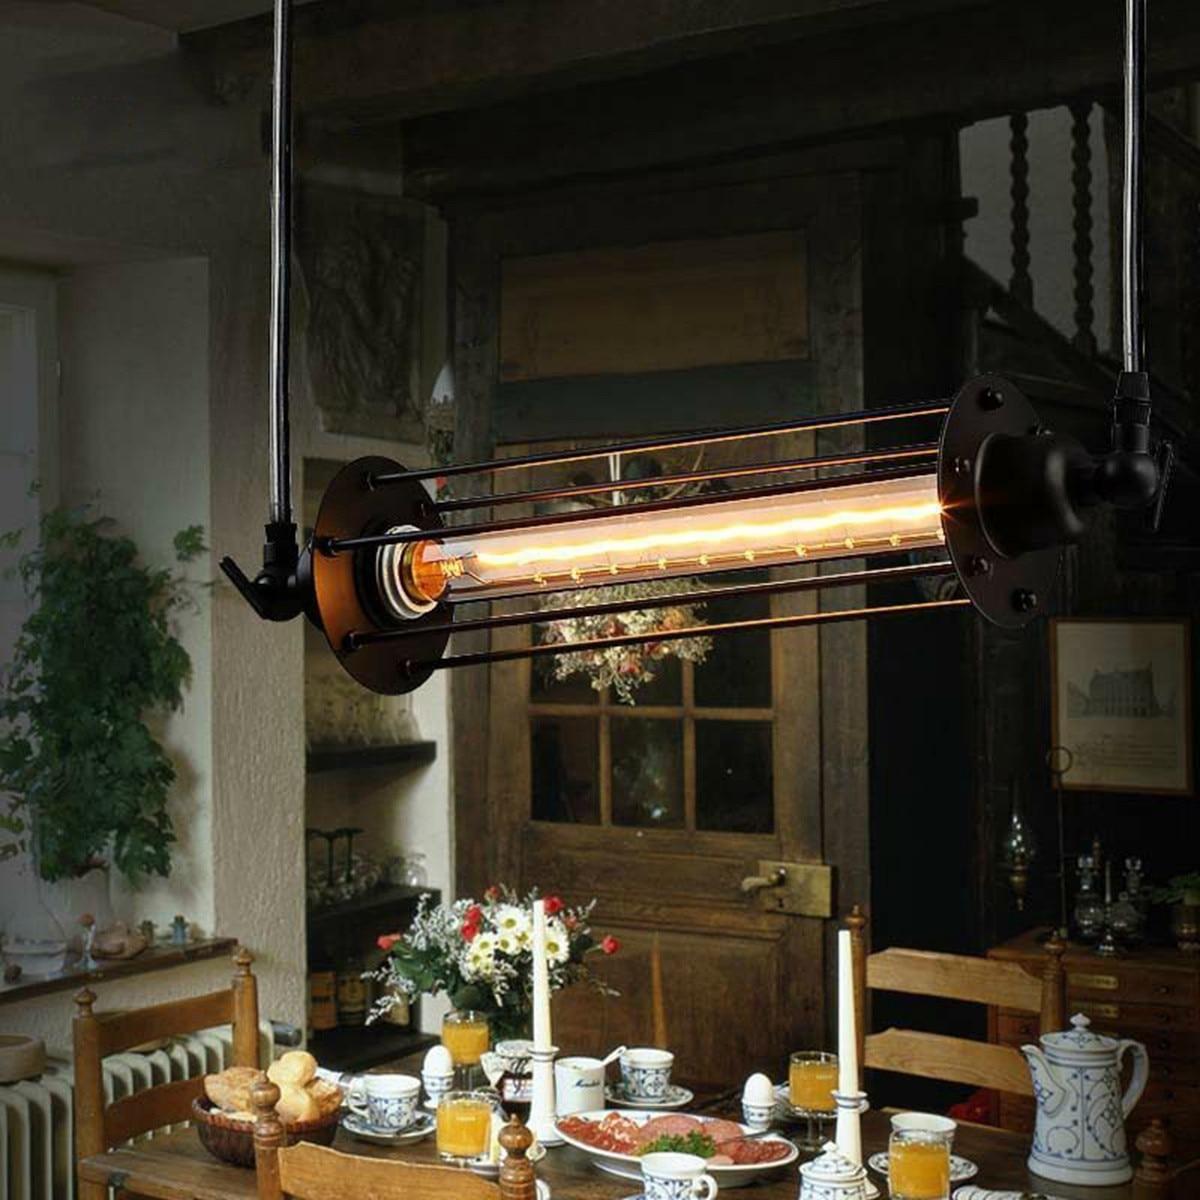 AC 110-240V Retro Vintage Flute Ceiling Lamp E27 Bulb Hanging Pendant Light Cafe Bar Restaurant Indoor Lighting Decor